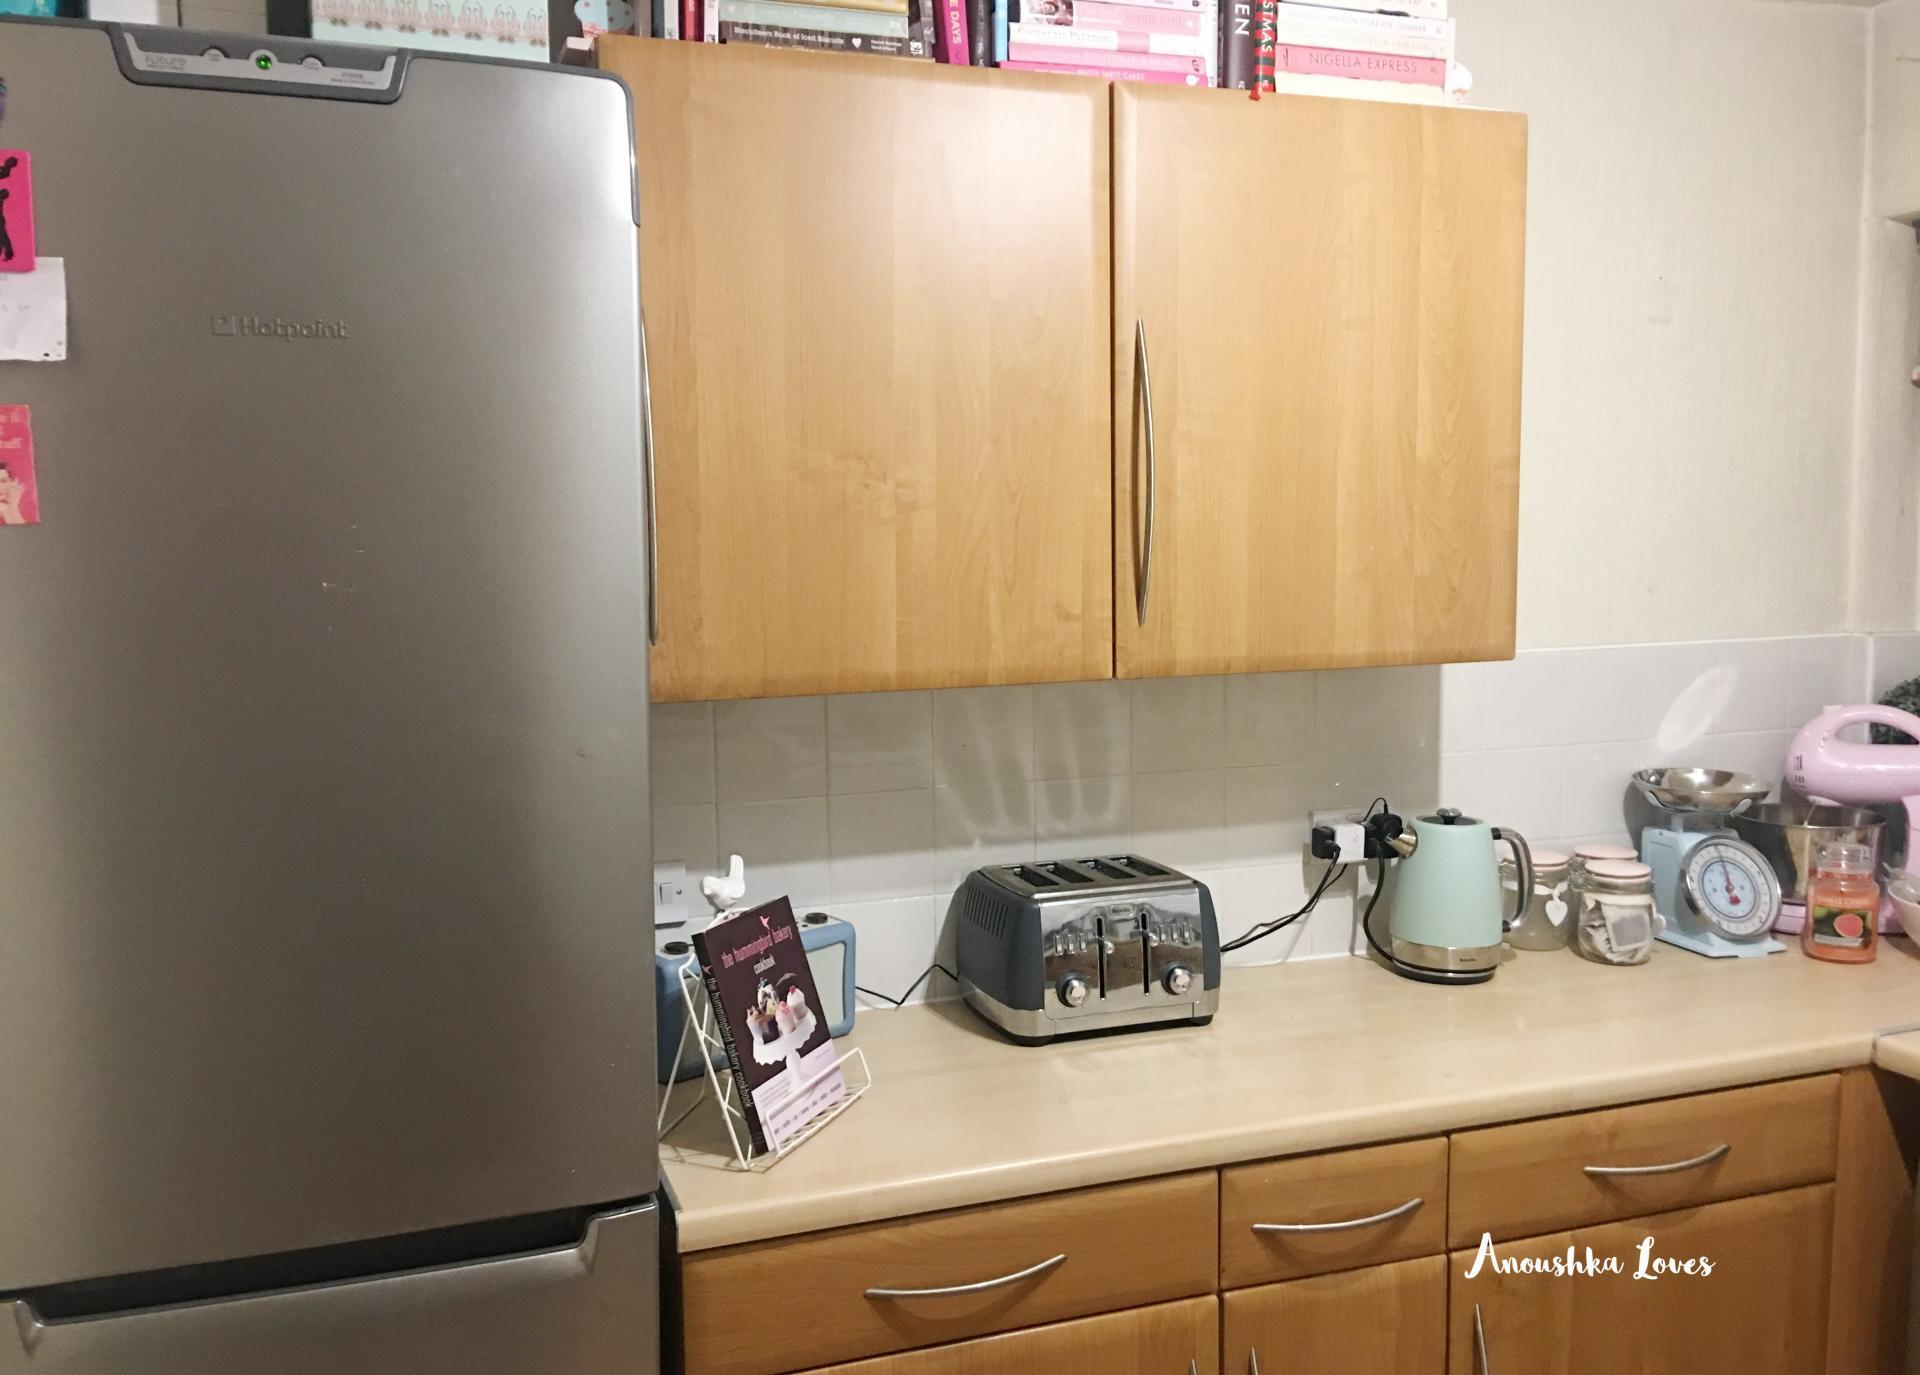 Lifestyle - Updating My Kitchen